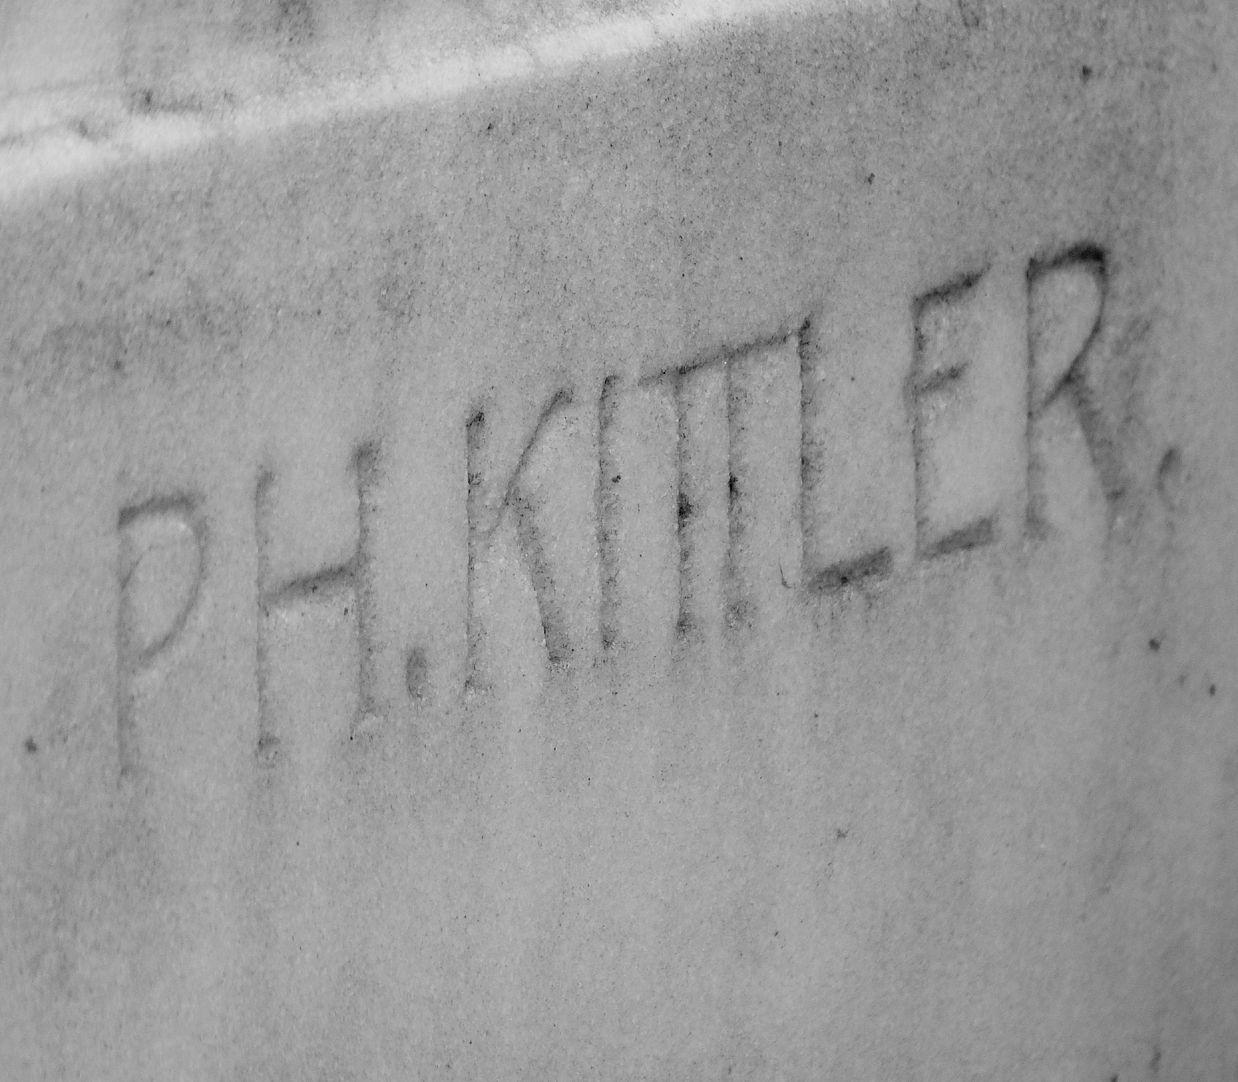 Sepulchral monument of the family Zeltner Artist's signature at the lower right corner